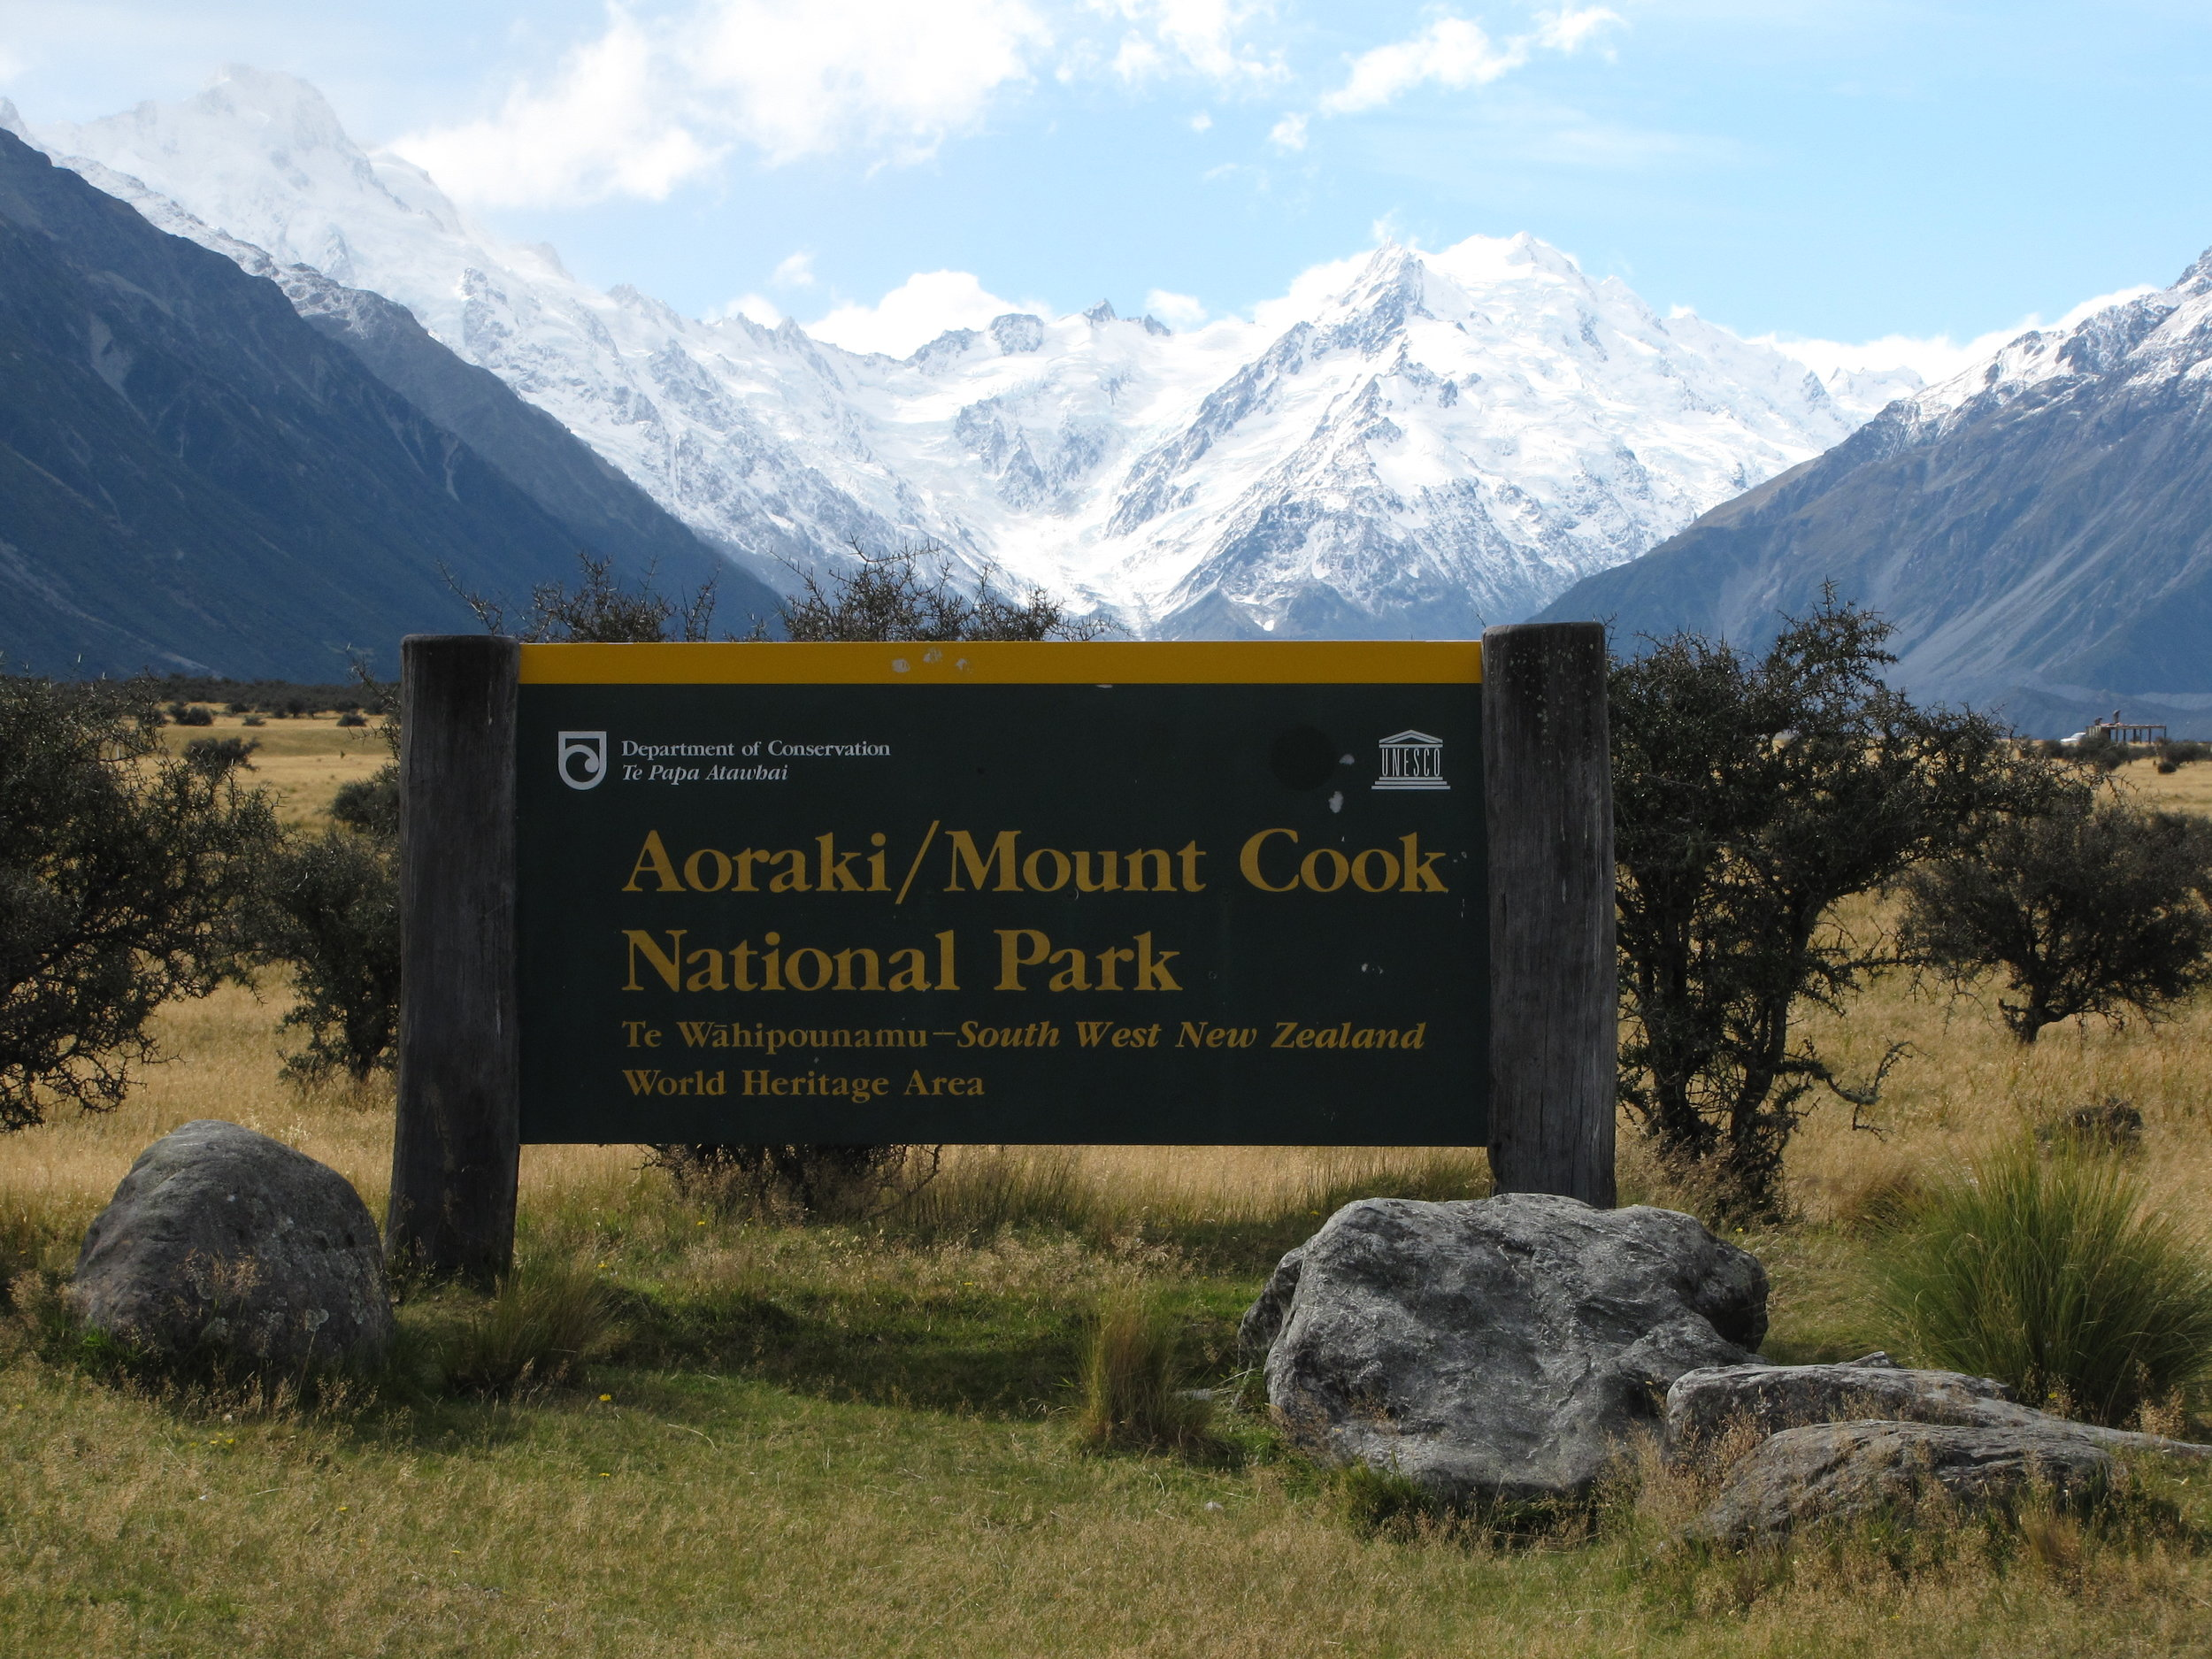 Aoraki / Mount Cook National Park was outstanding!